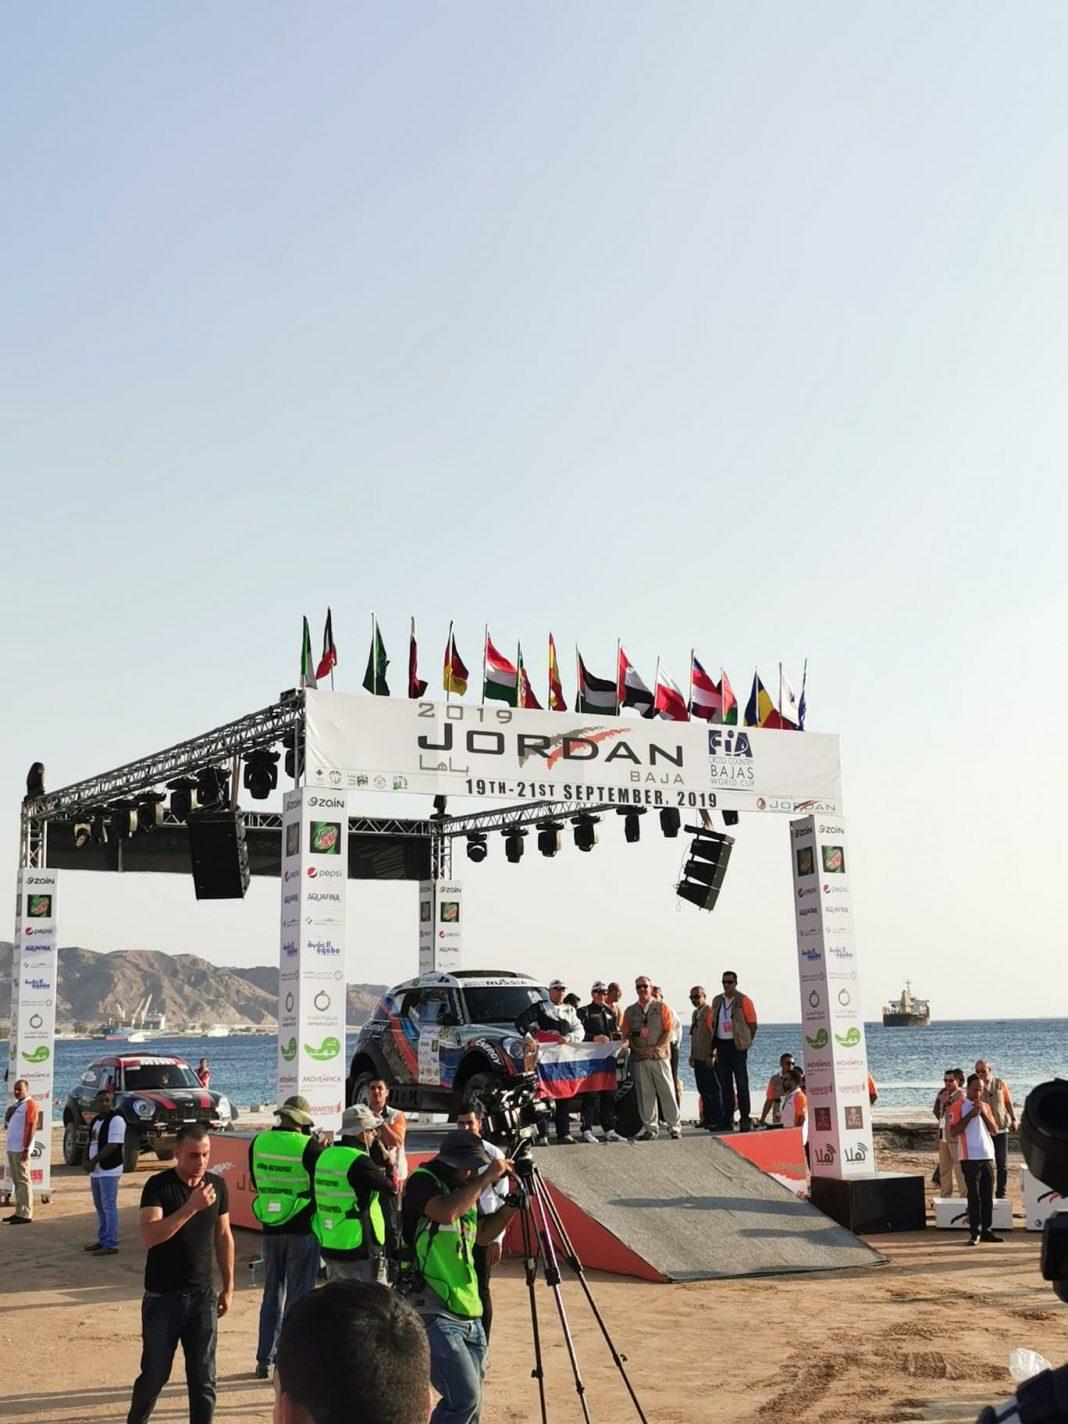 71171197_544570736084729_8020784213336784896_n-1068x1424 Jakub Przygonski castiga prima editie Jordan Baja